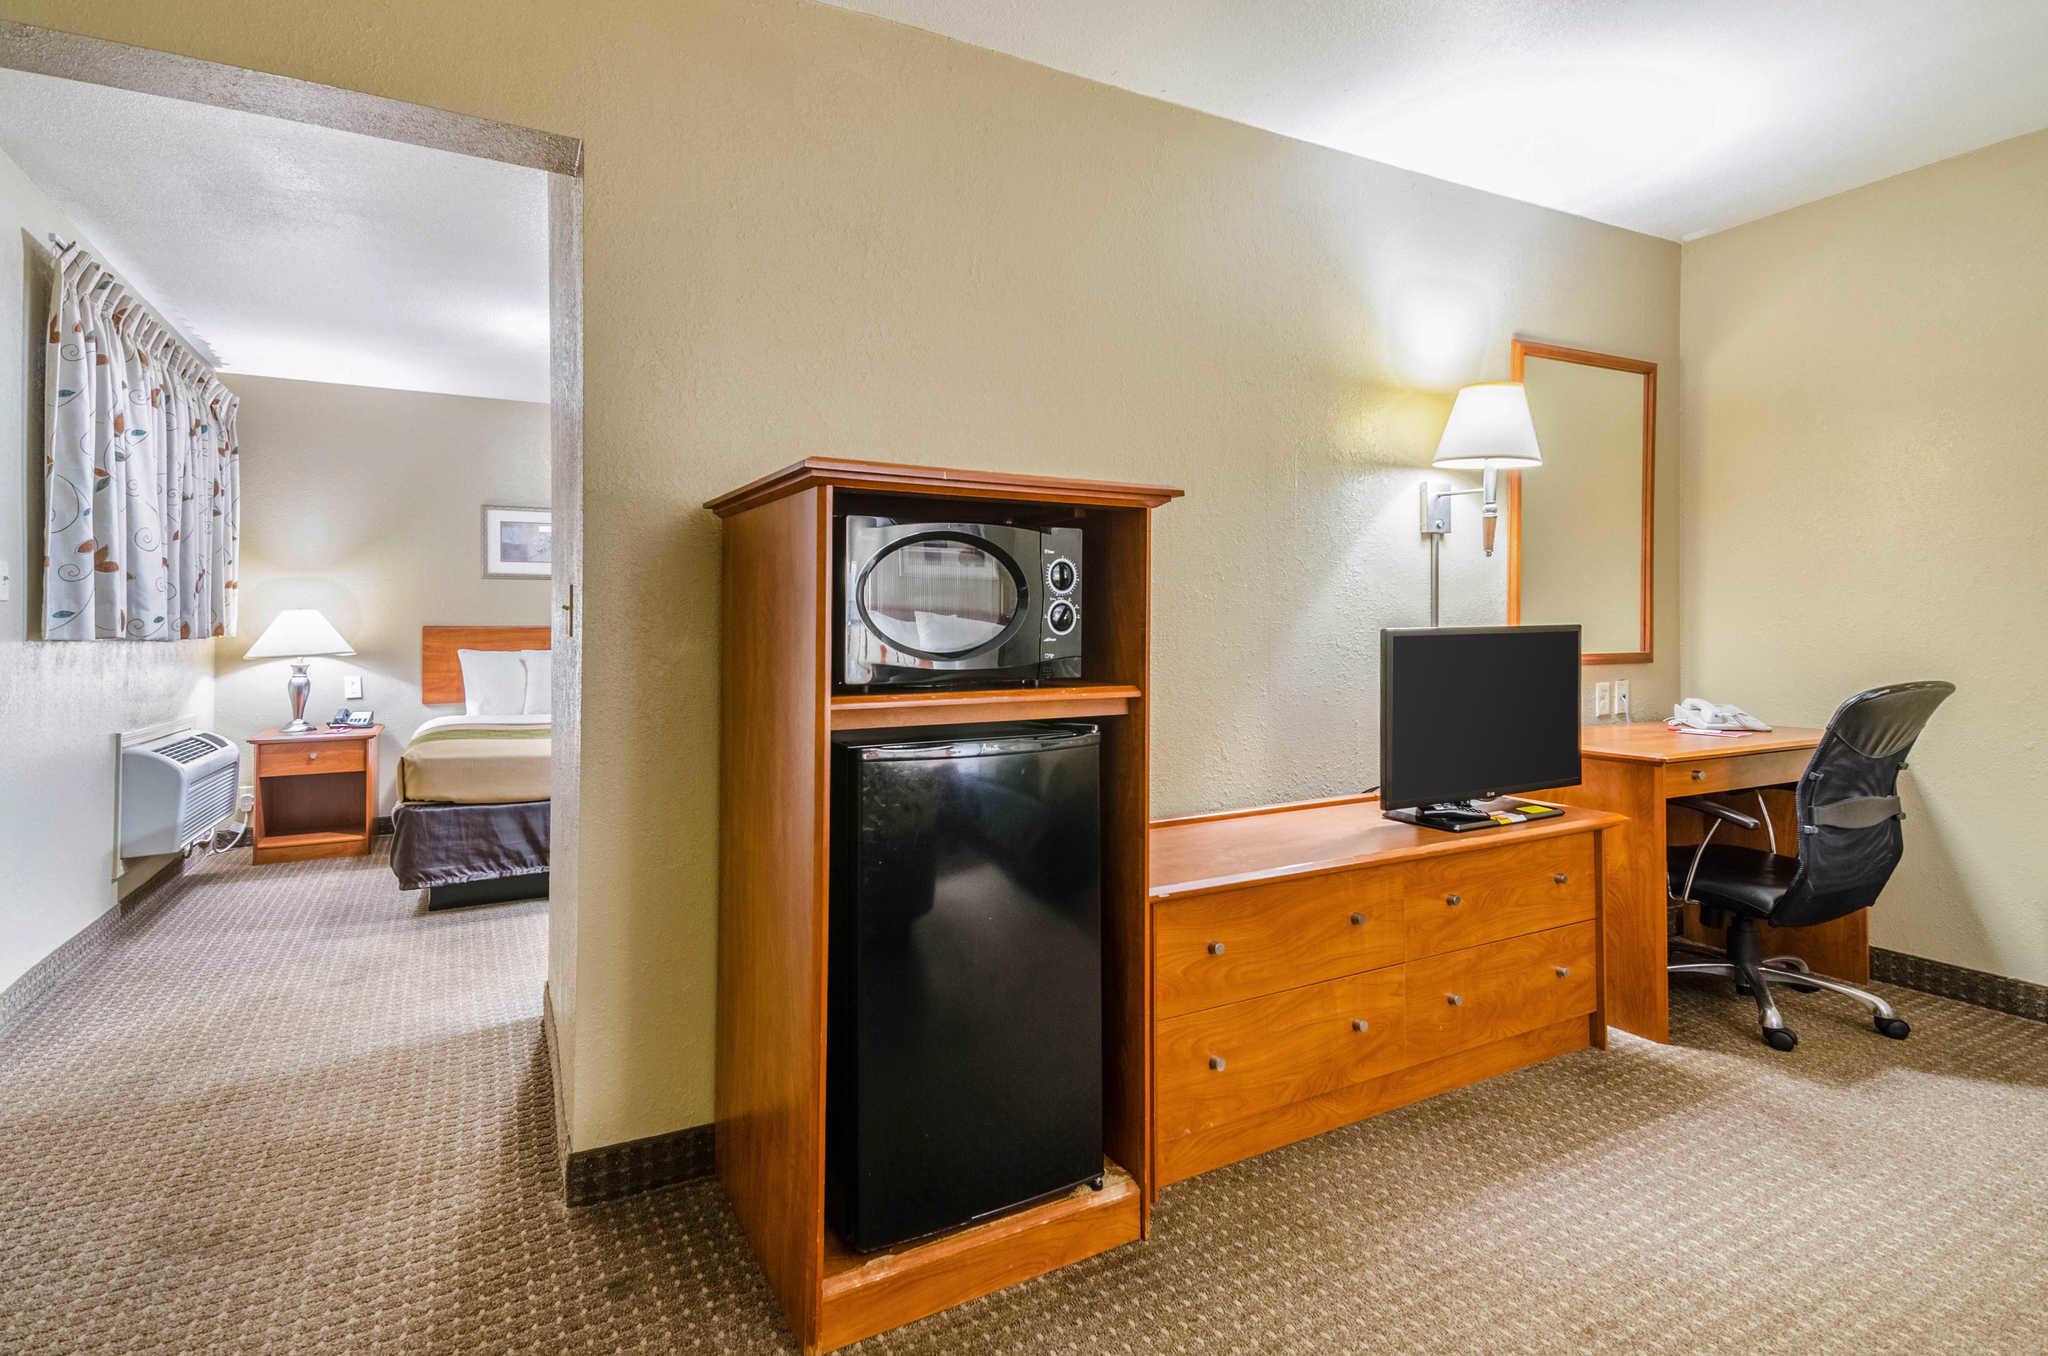 Econo Lodge  Inn & Suites I-35 at Shawnee Mission image 30